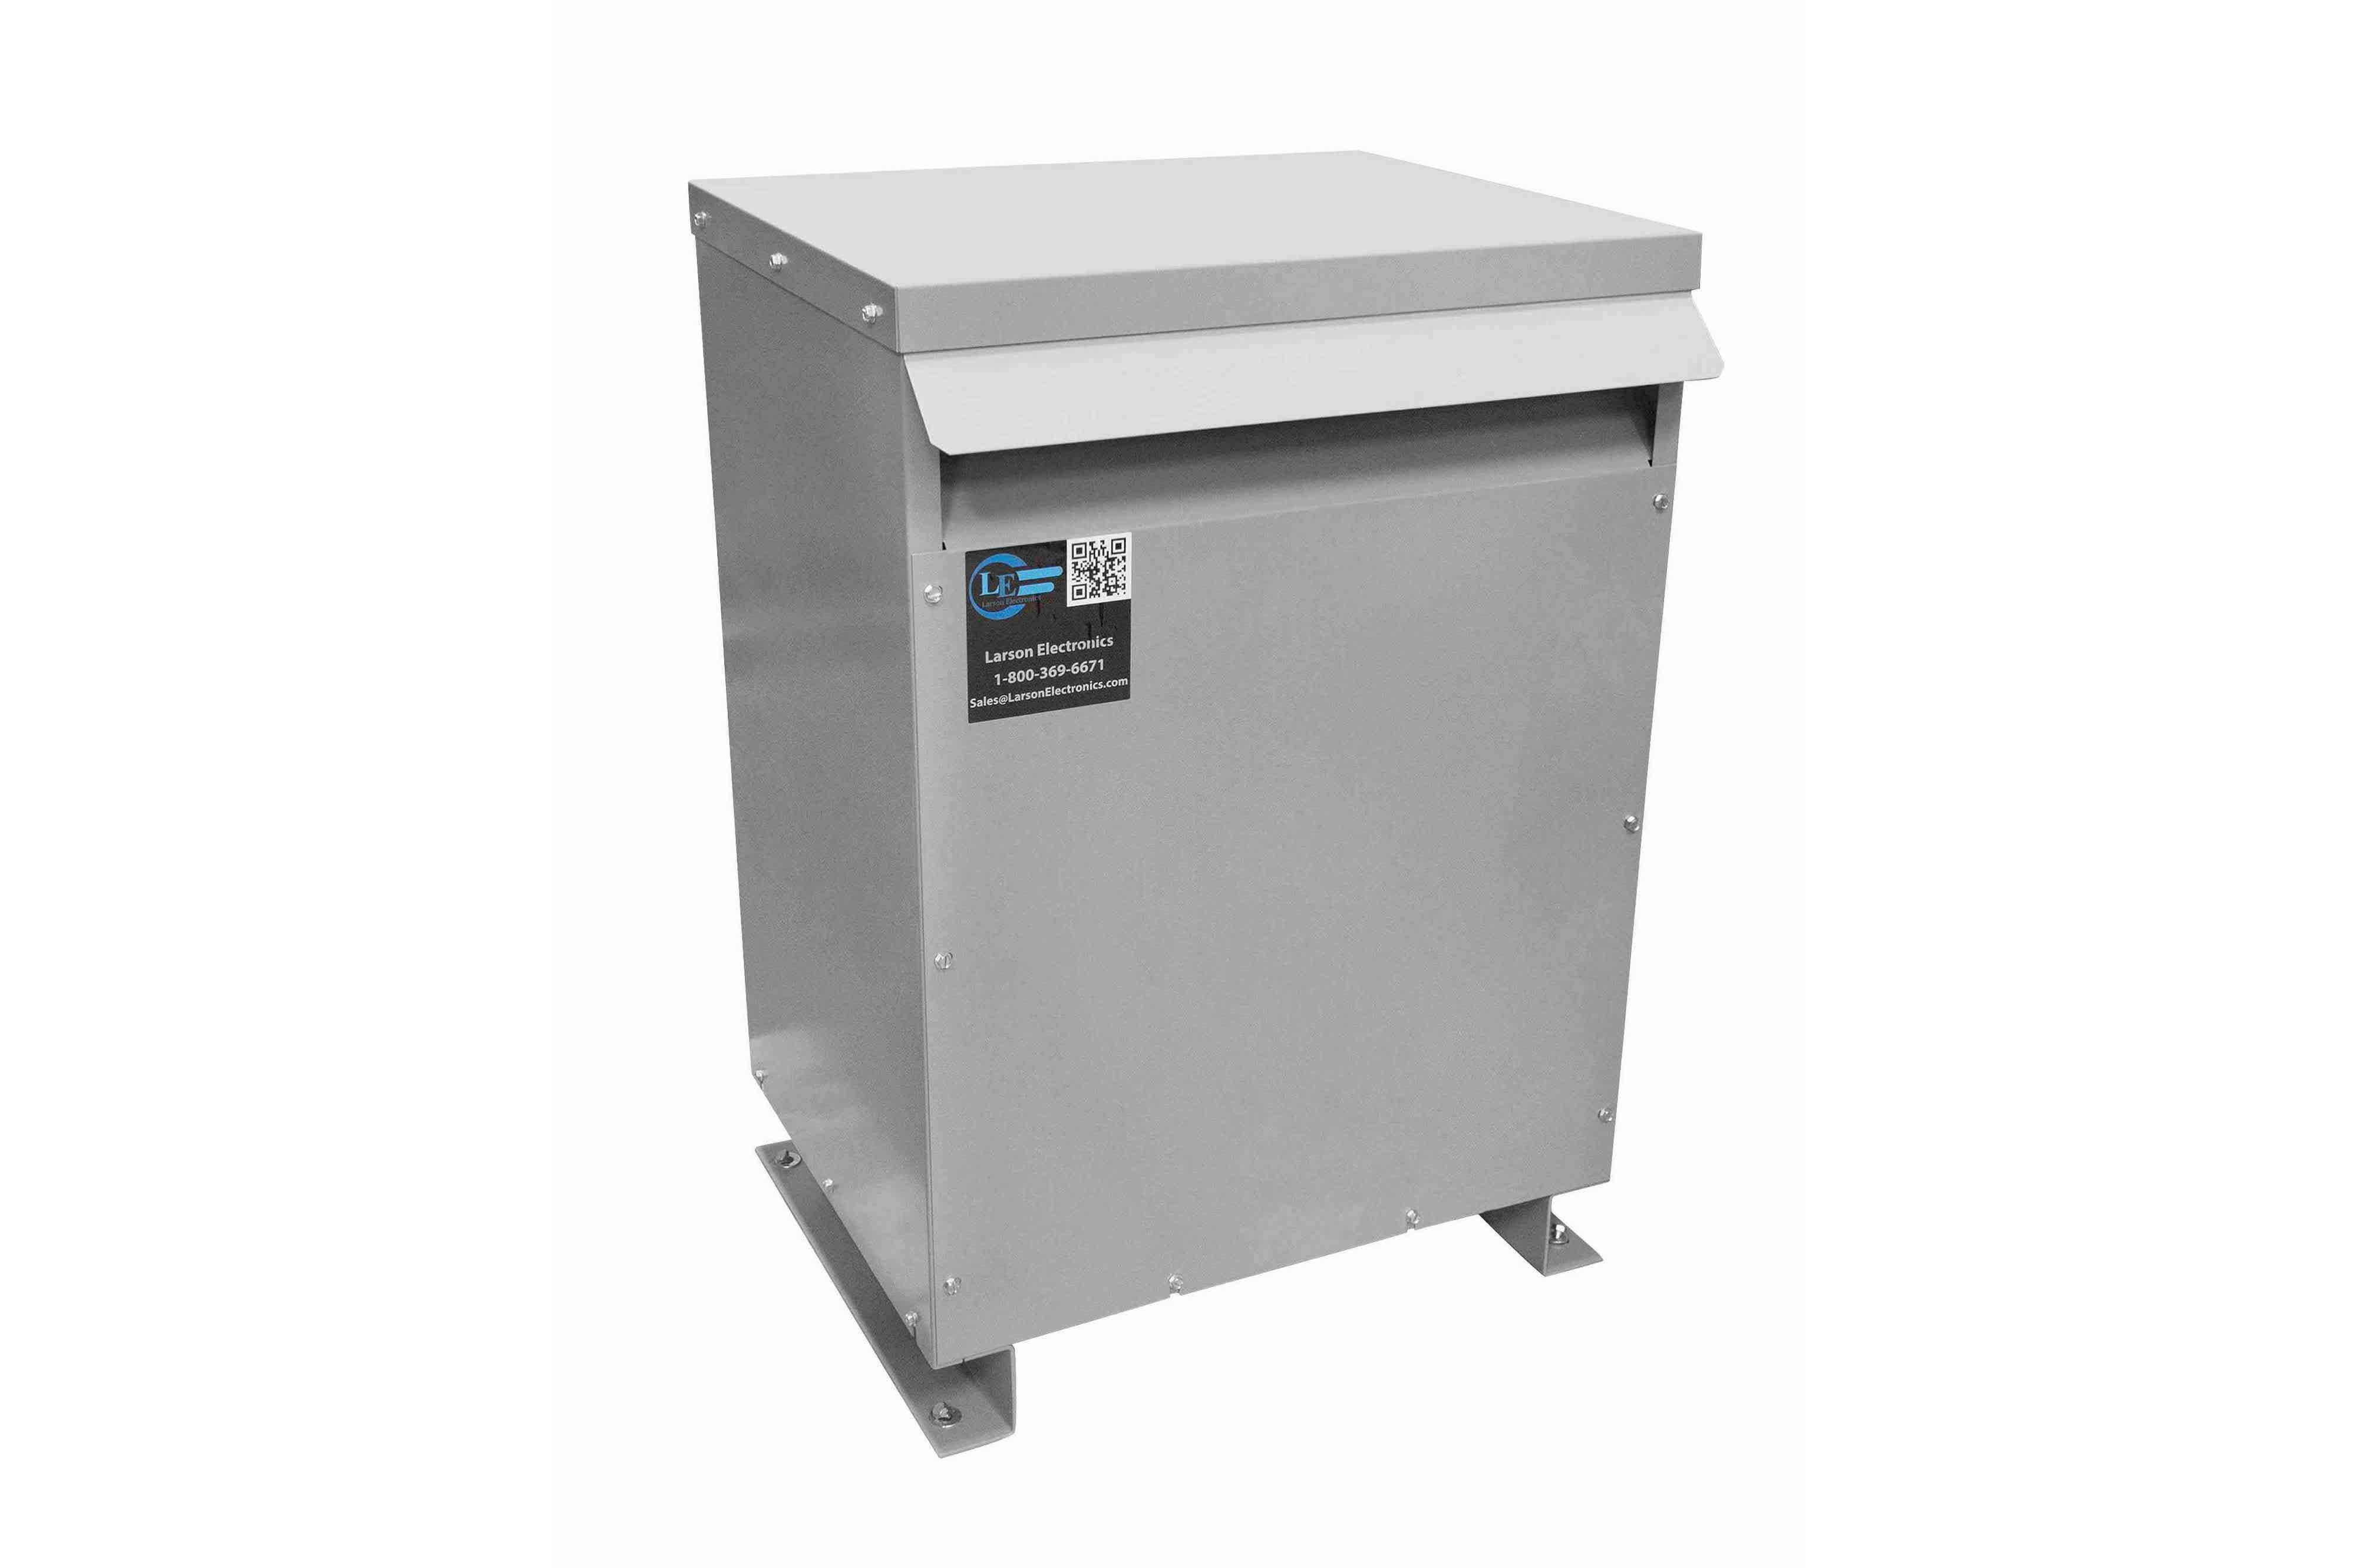 275 kVA 3PH Isolation Transformer, 600V Wye Primary, 208Y/120 Wye-N Secondary, N3R, Ventilated, 60 Hz